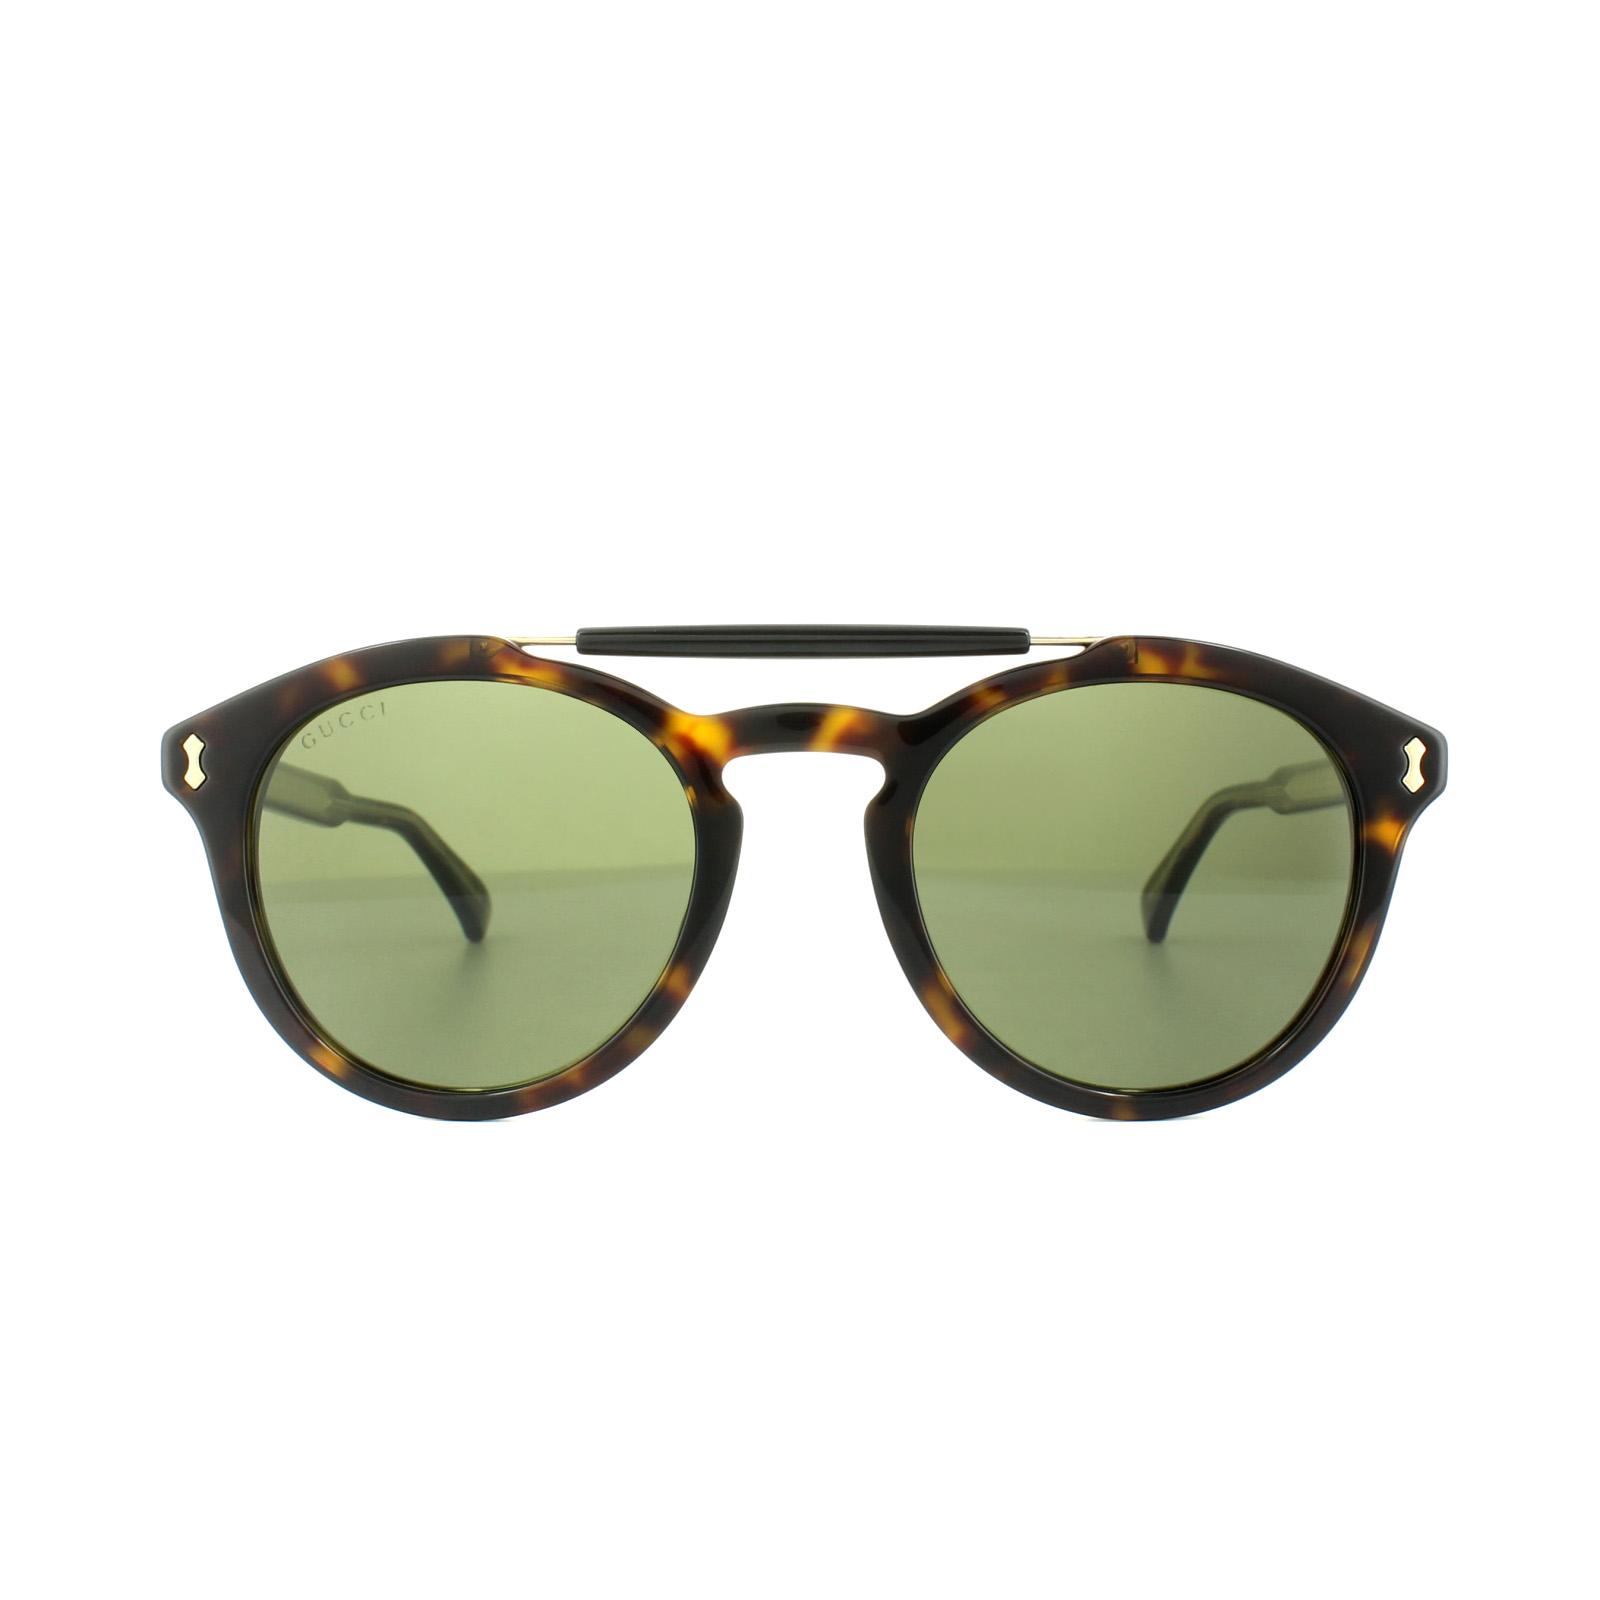 Gucci Herren Sonnenbrille GG0124S 002, Braun (Avana/Green), 50